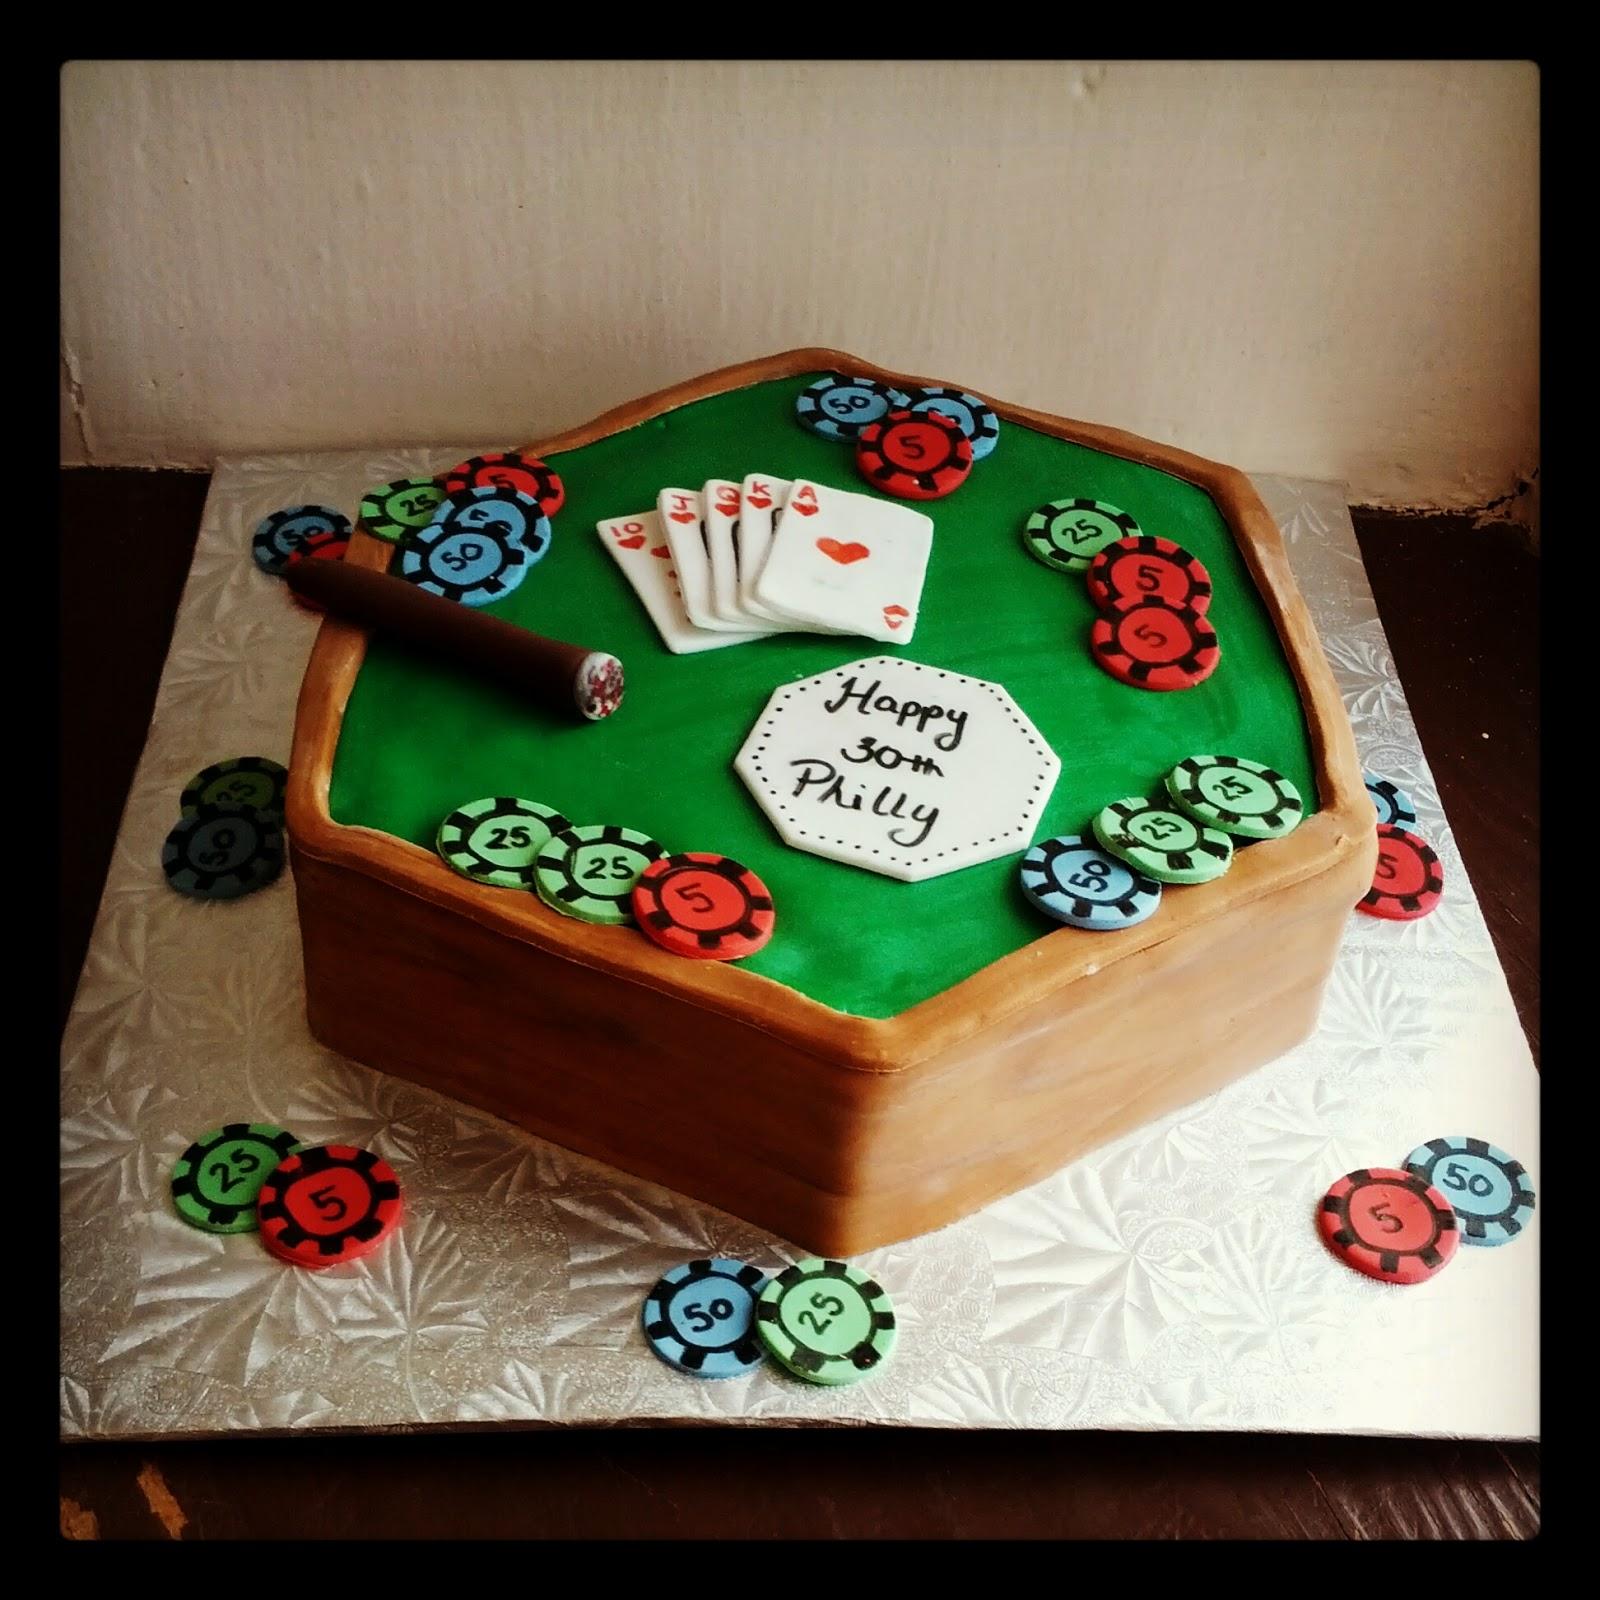 Second Generation Cake Design Poker Table Birthday Cake